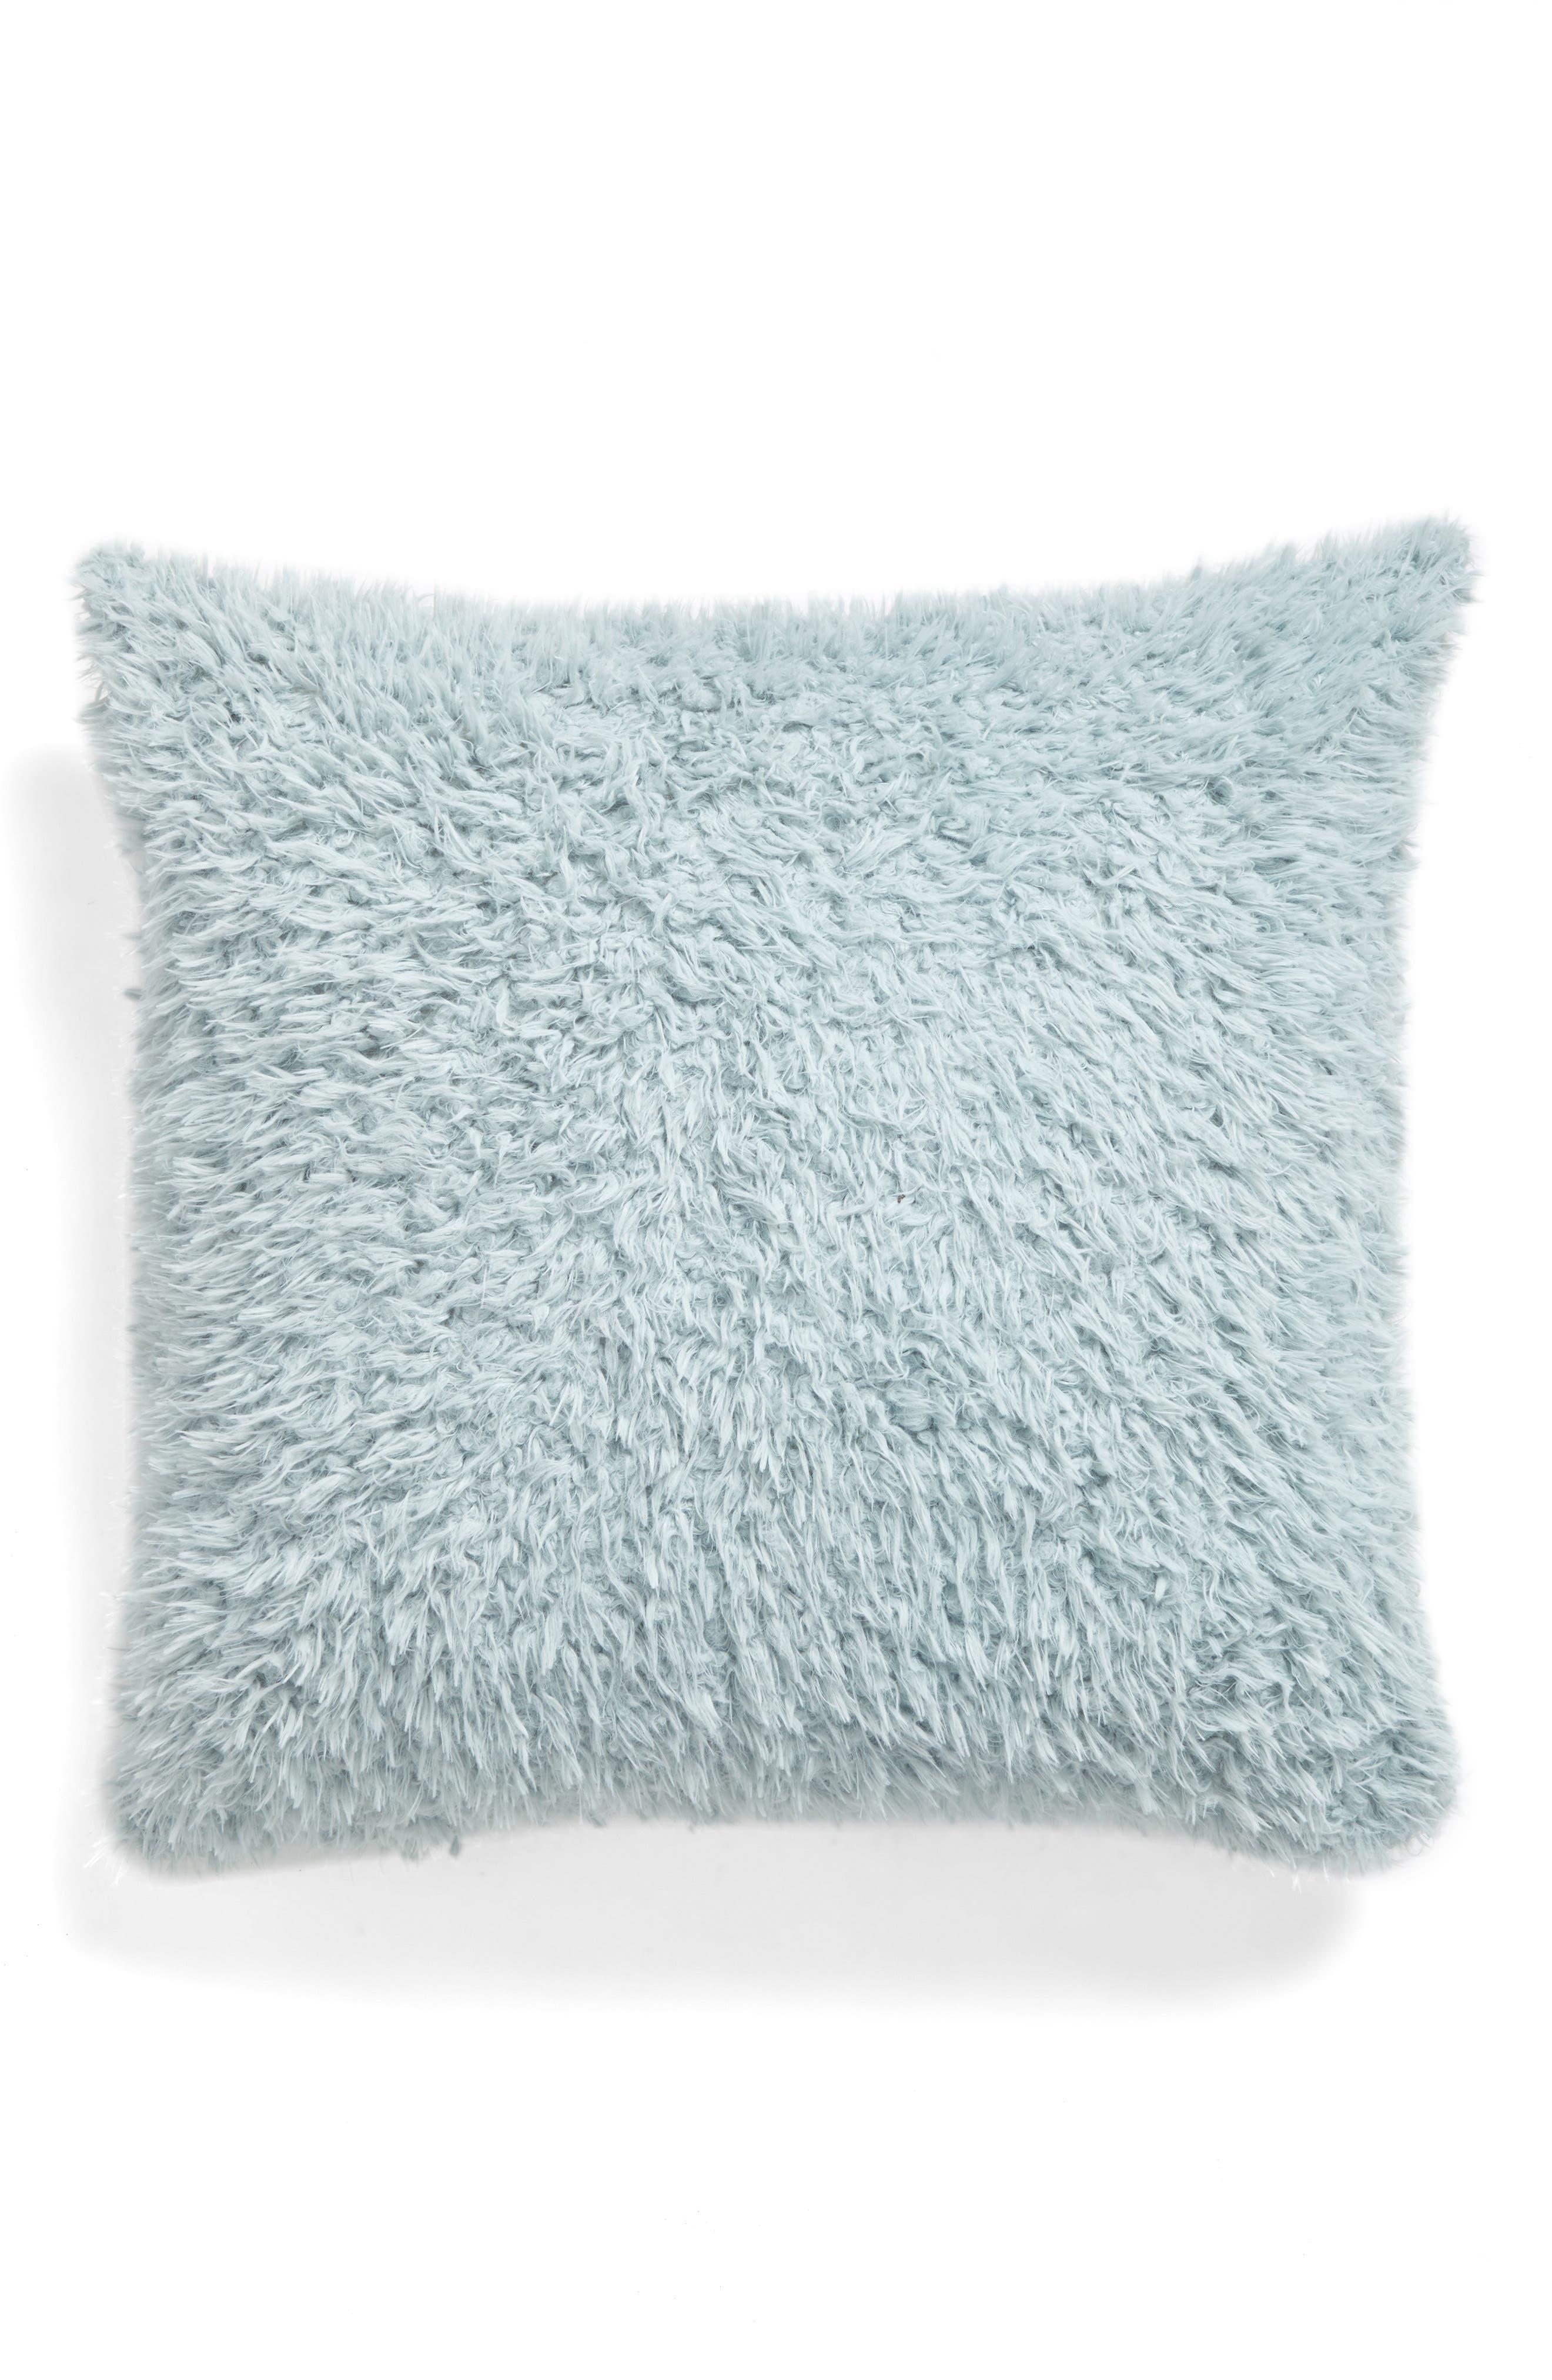 Shaggy Plush Pillow,                         Main,                         color, Green Soft